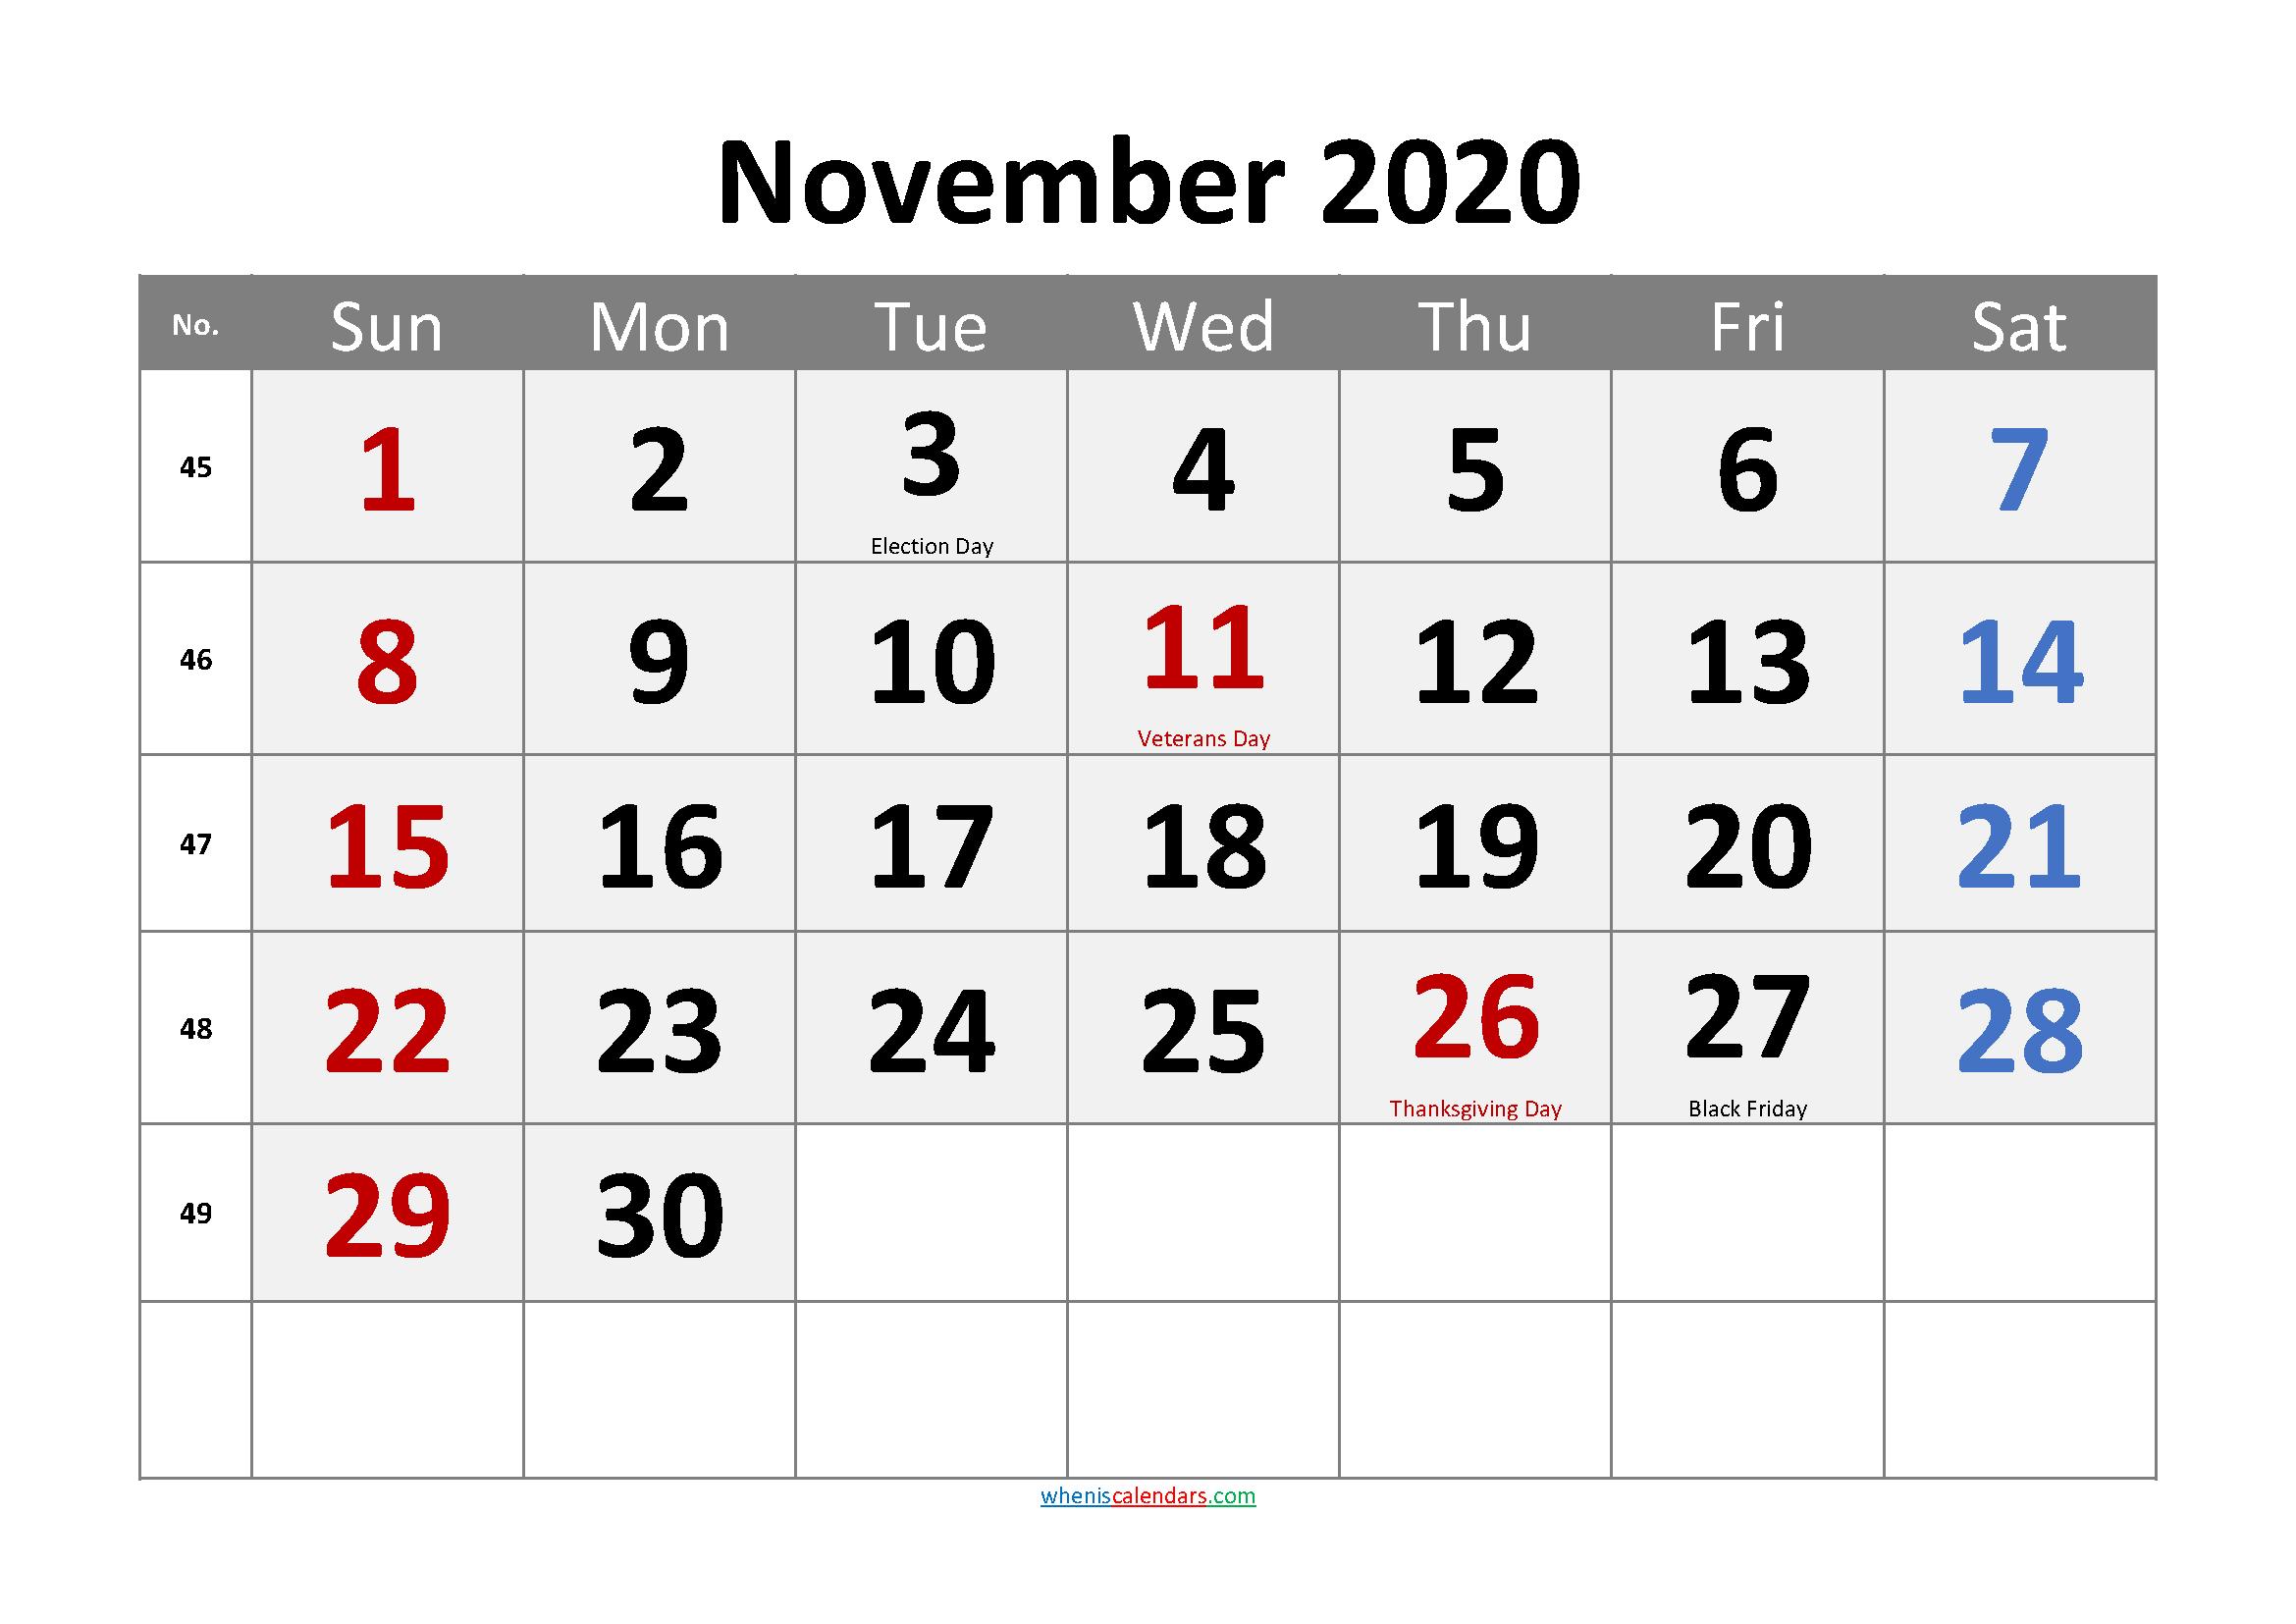 NOVEMBER 2020 Printable Calendar with Holidays